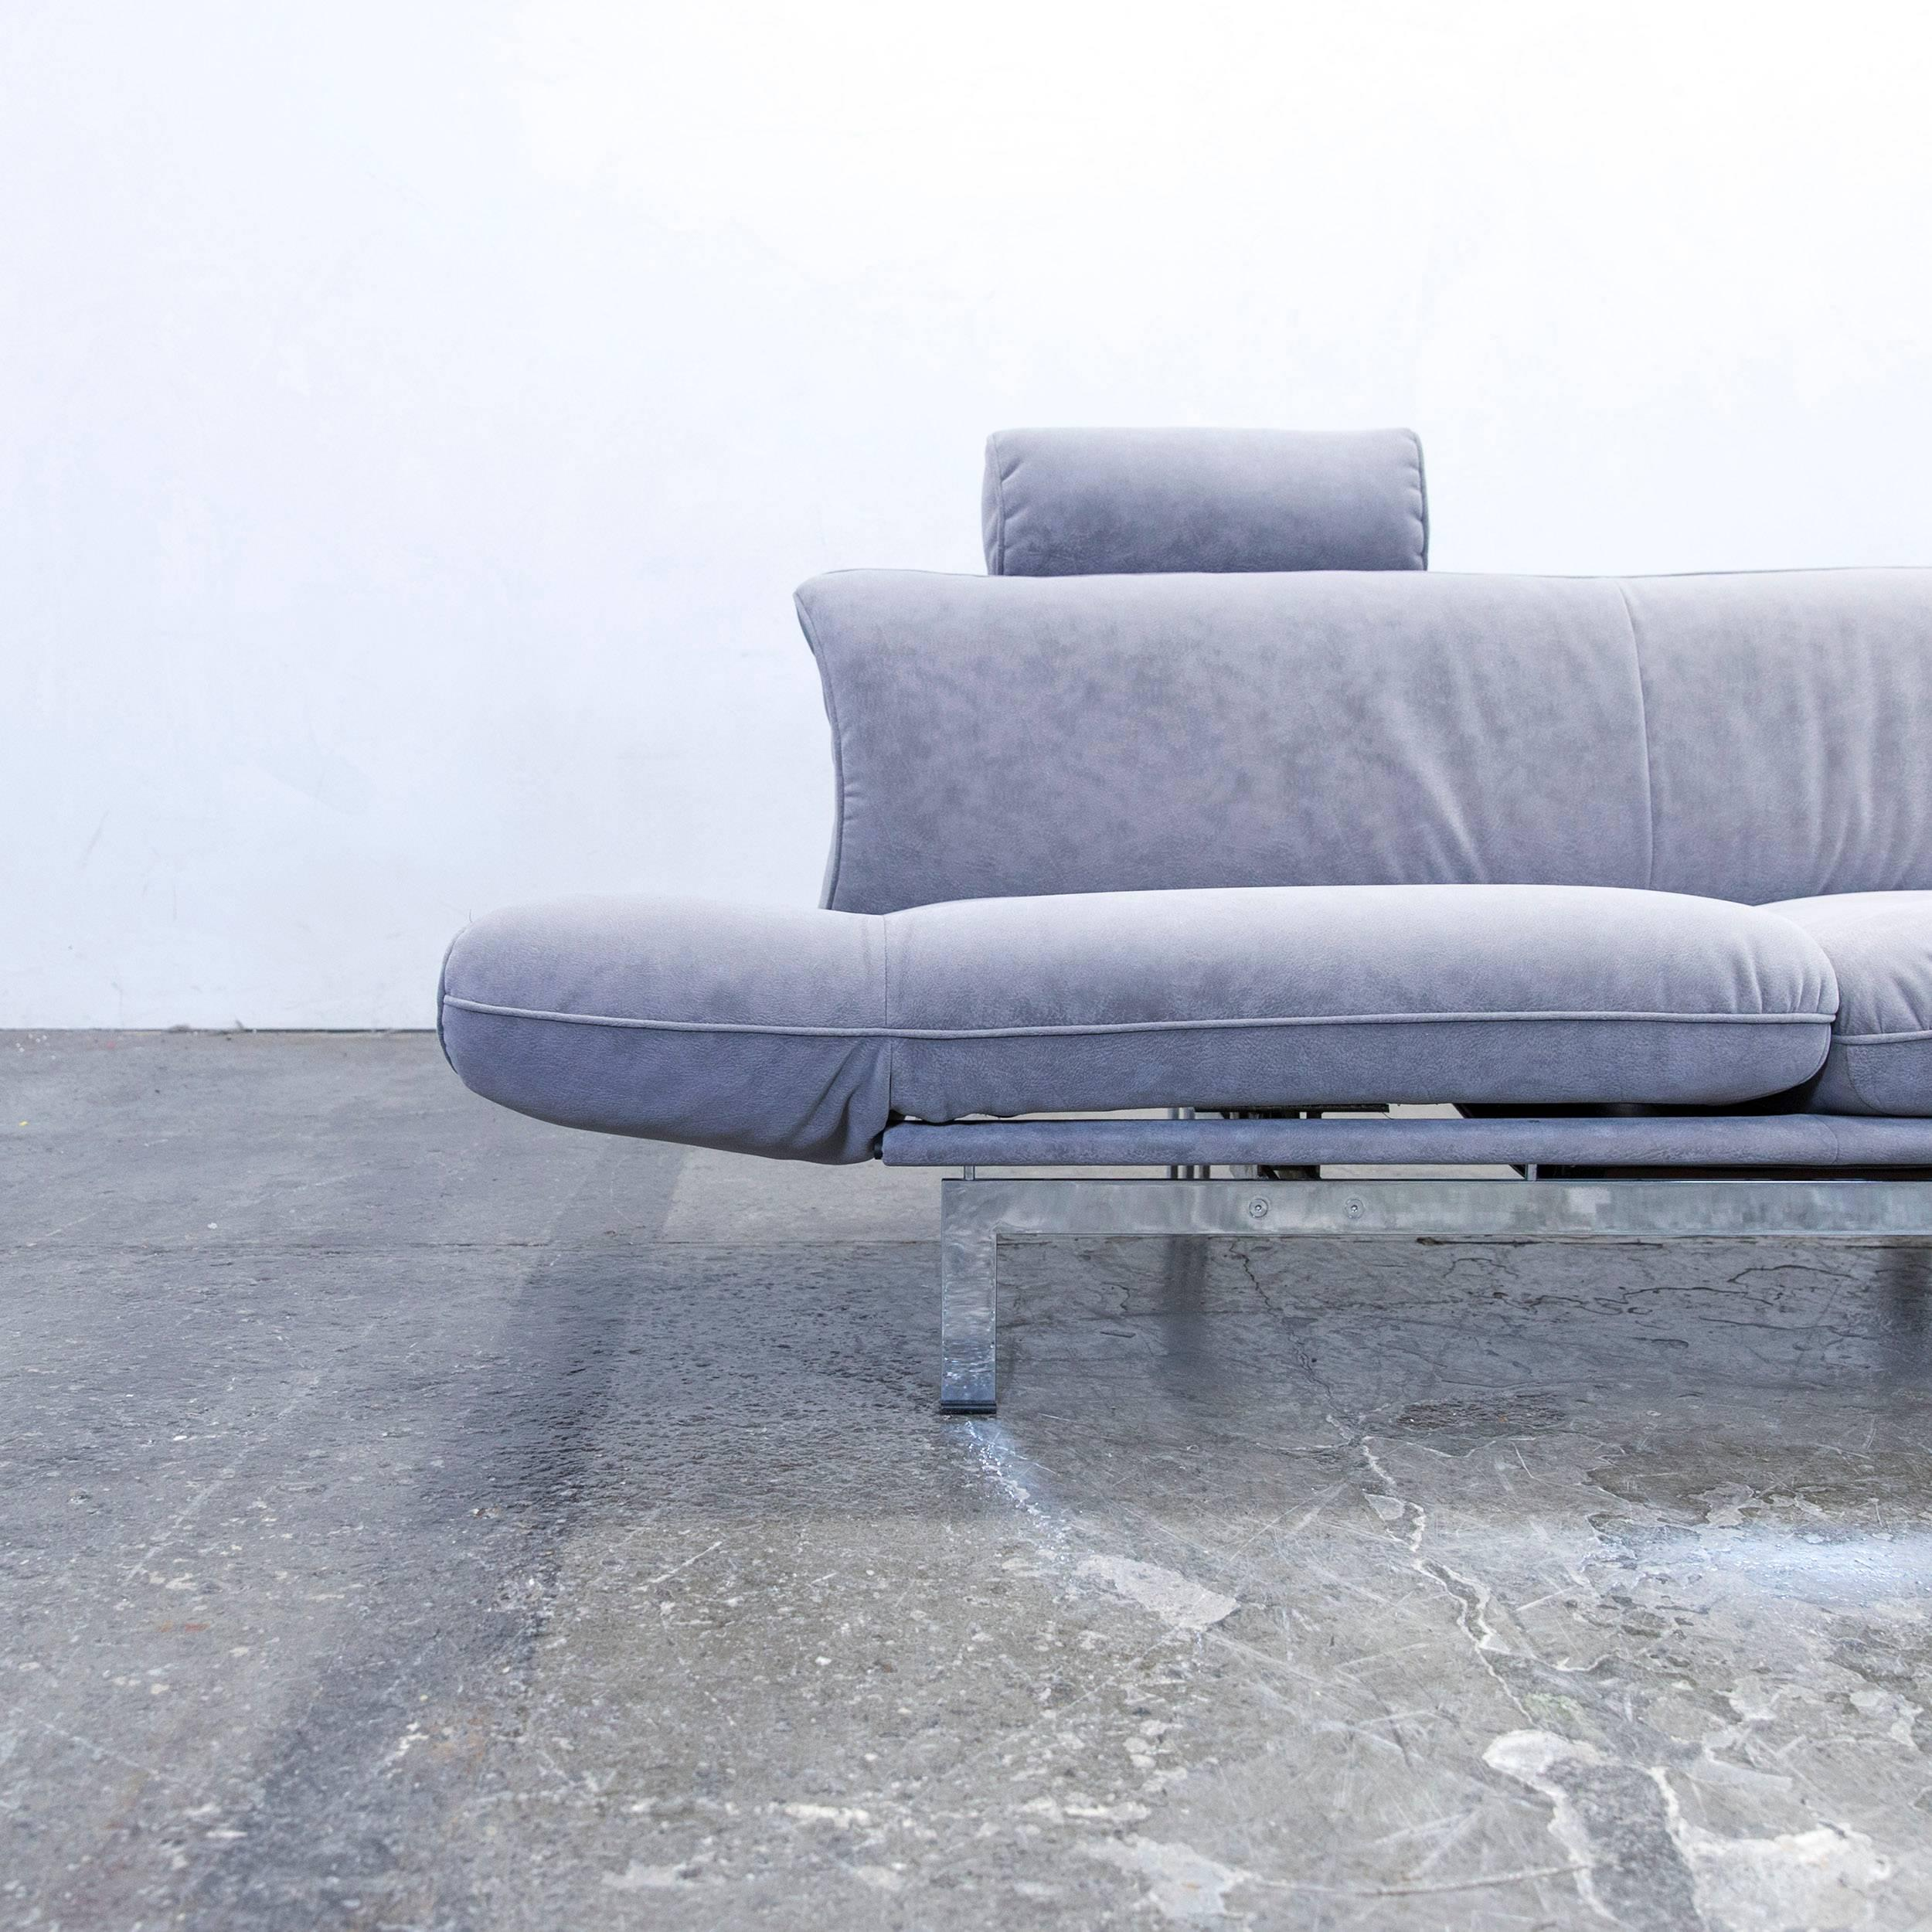 Grey Colored Original De Sede DS 140 Designer Sofa, In A Minimalistic And  Modern Design